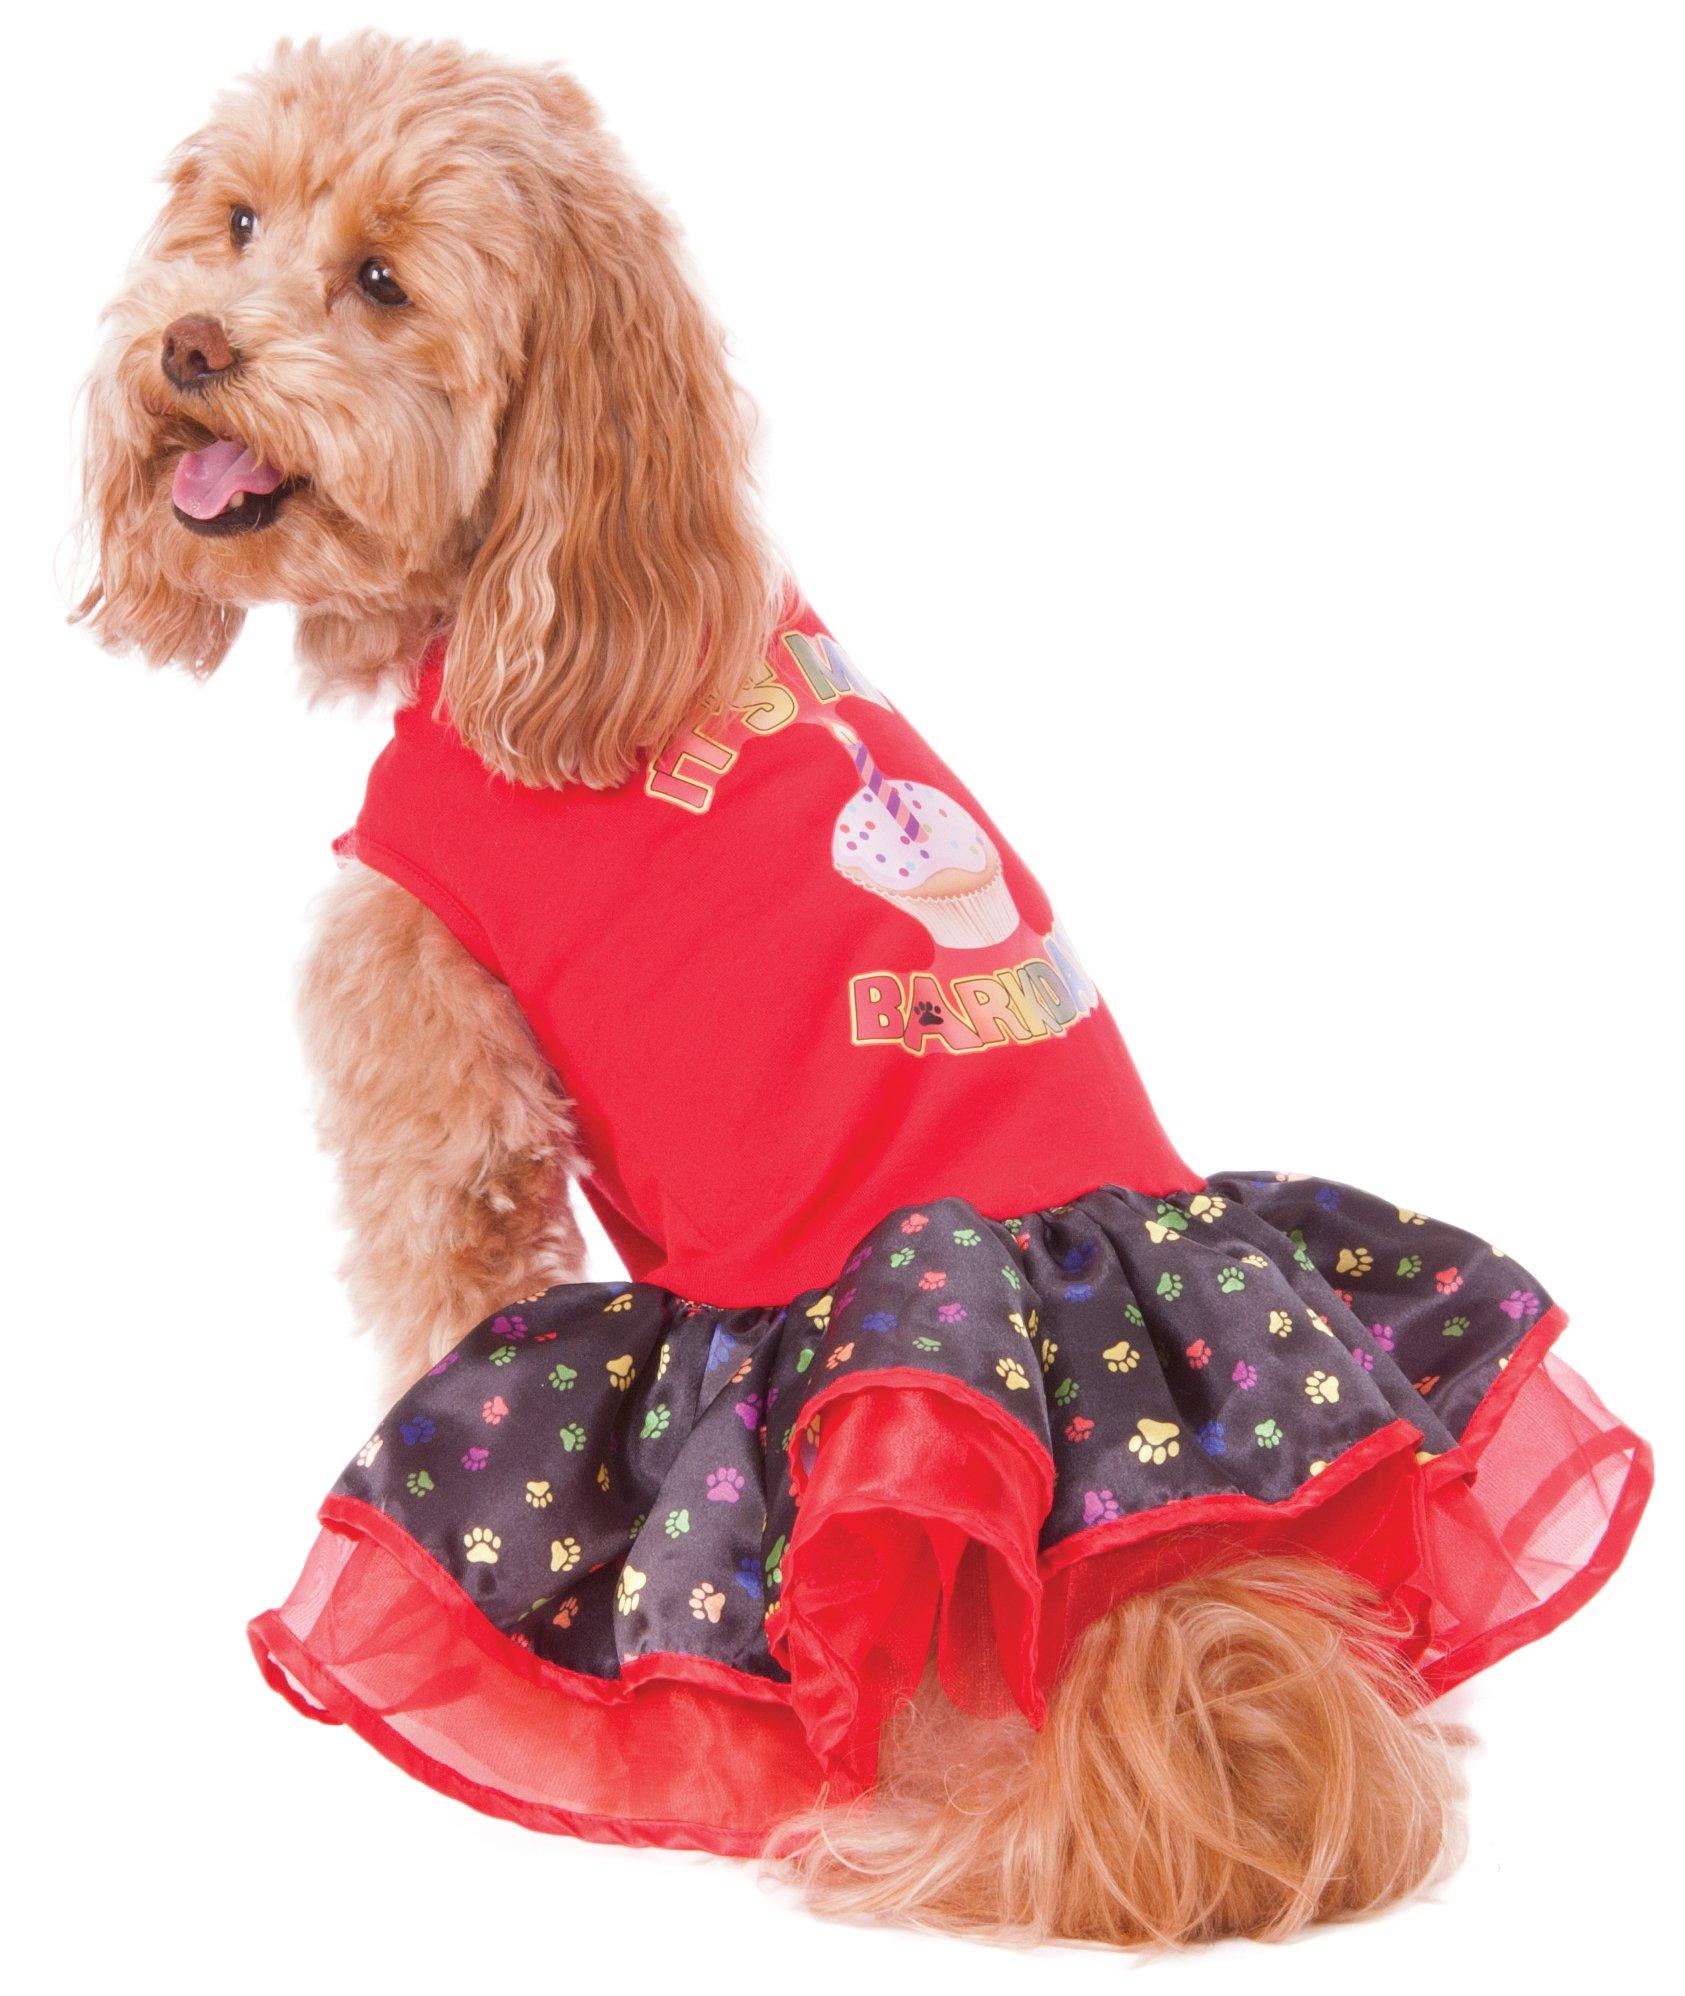 Rubie's Barkday Pet Tutu Dress, Medium, Multi-Colored by Rubie's